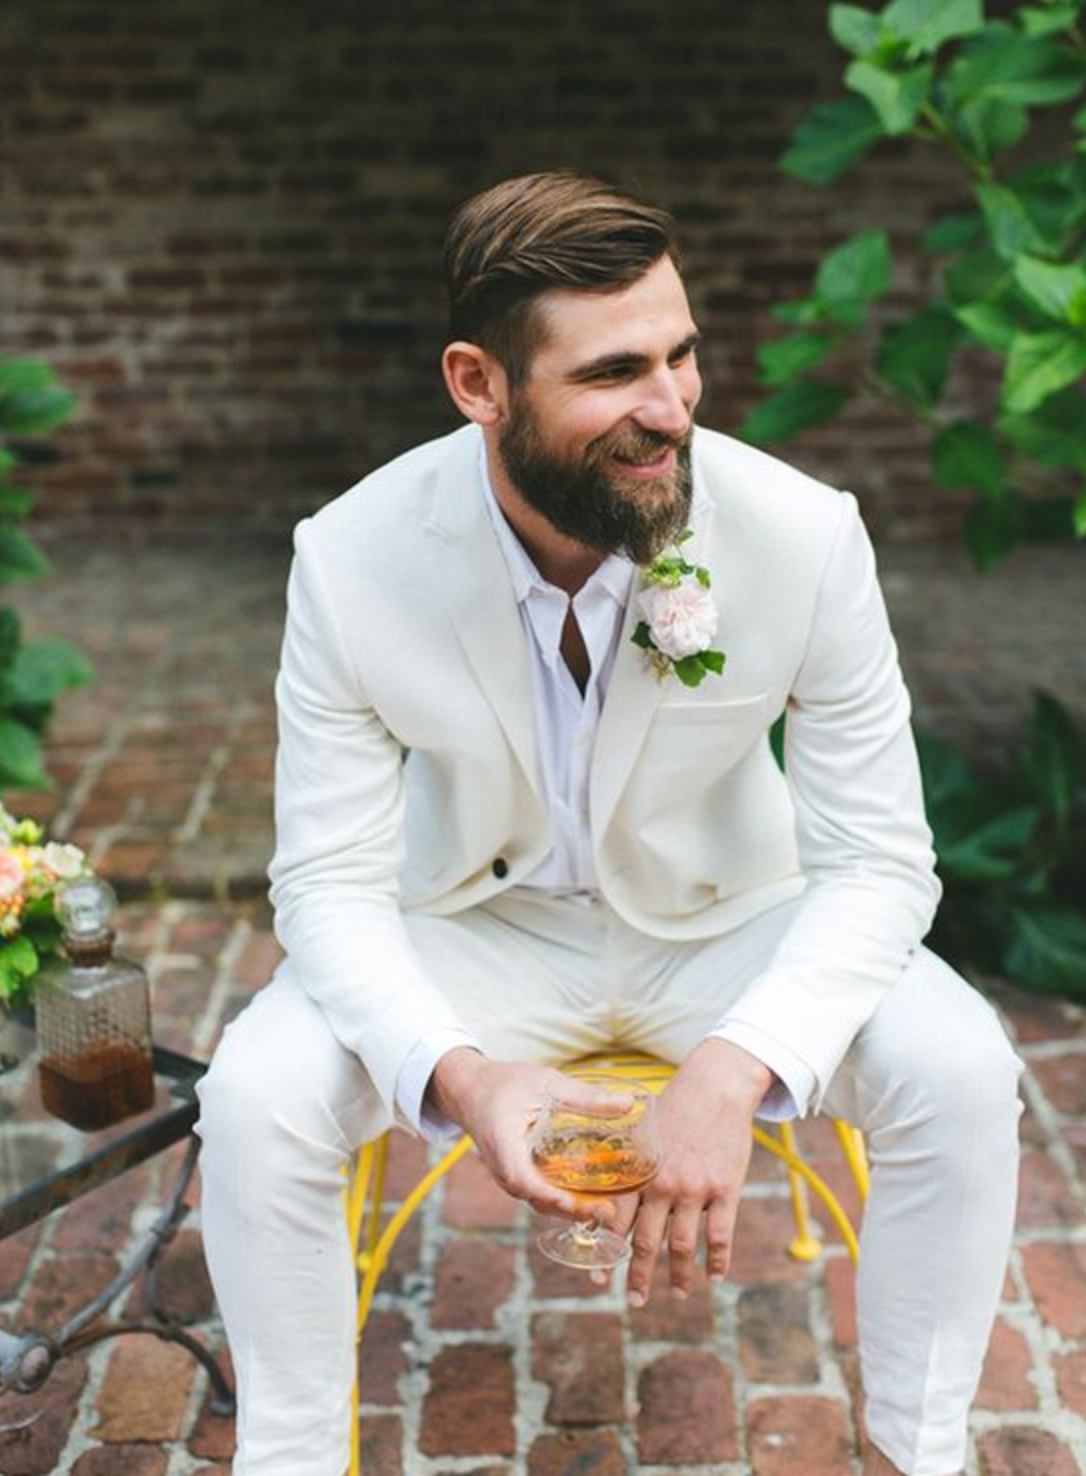 All White Suit Summer Wedding Ideas Grooms Groom